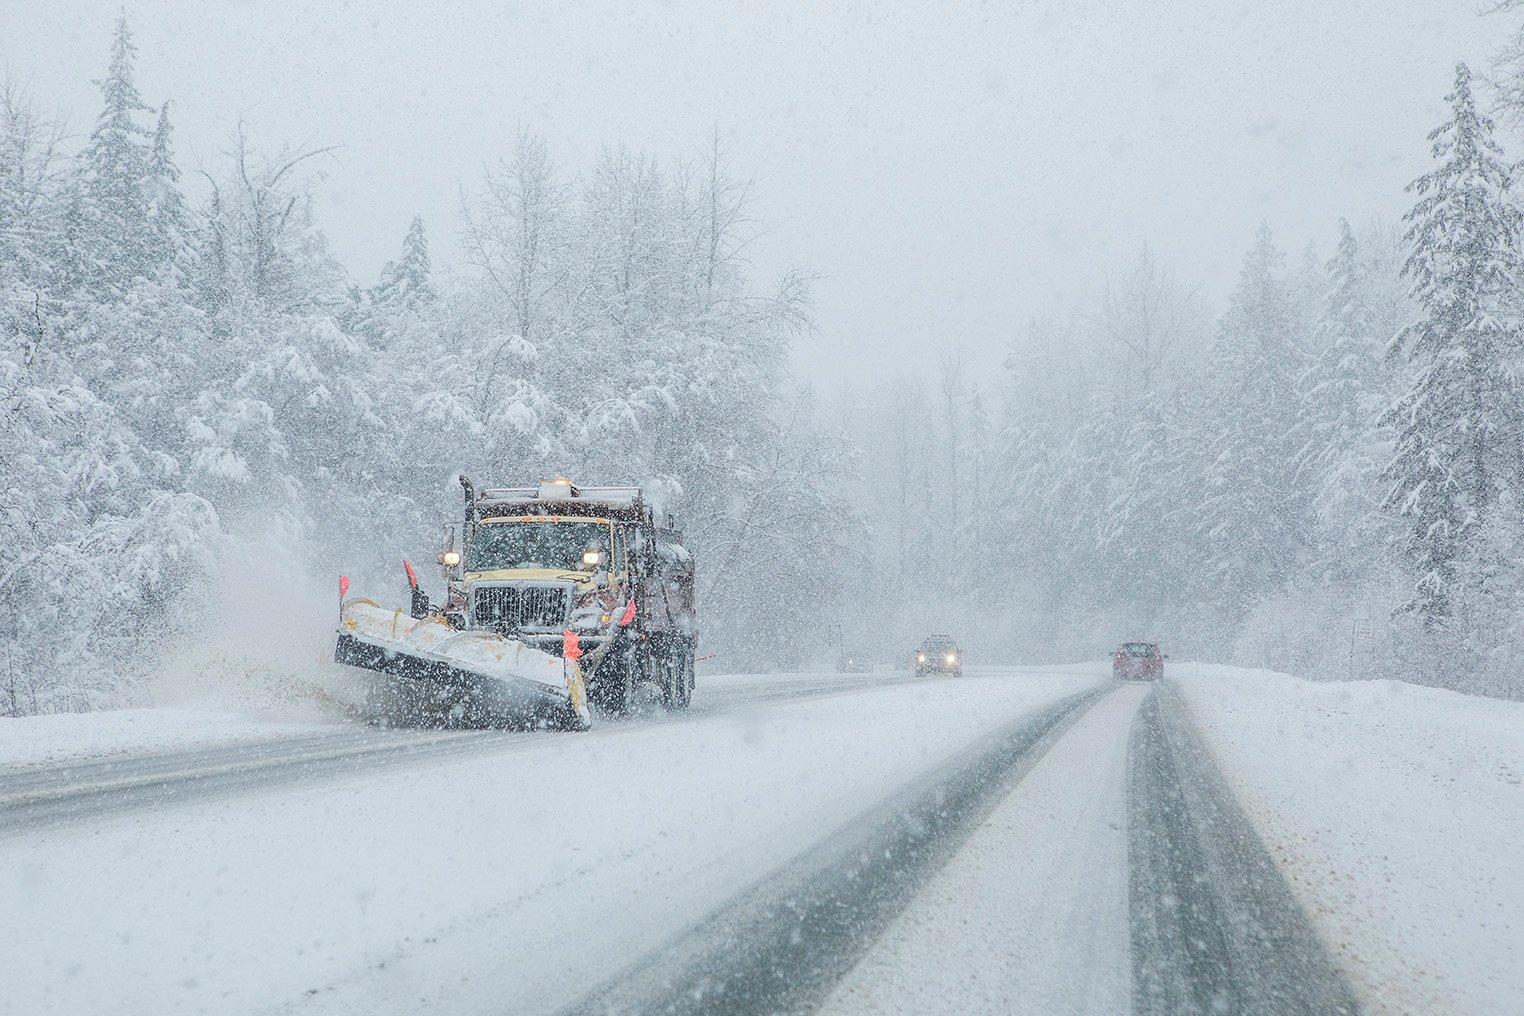 snowplow-iStock-926898416